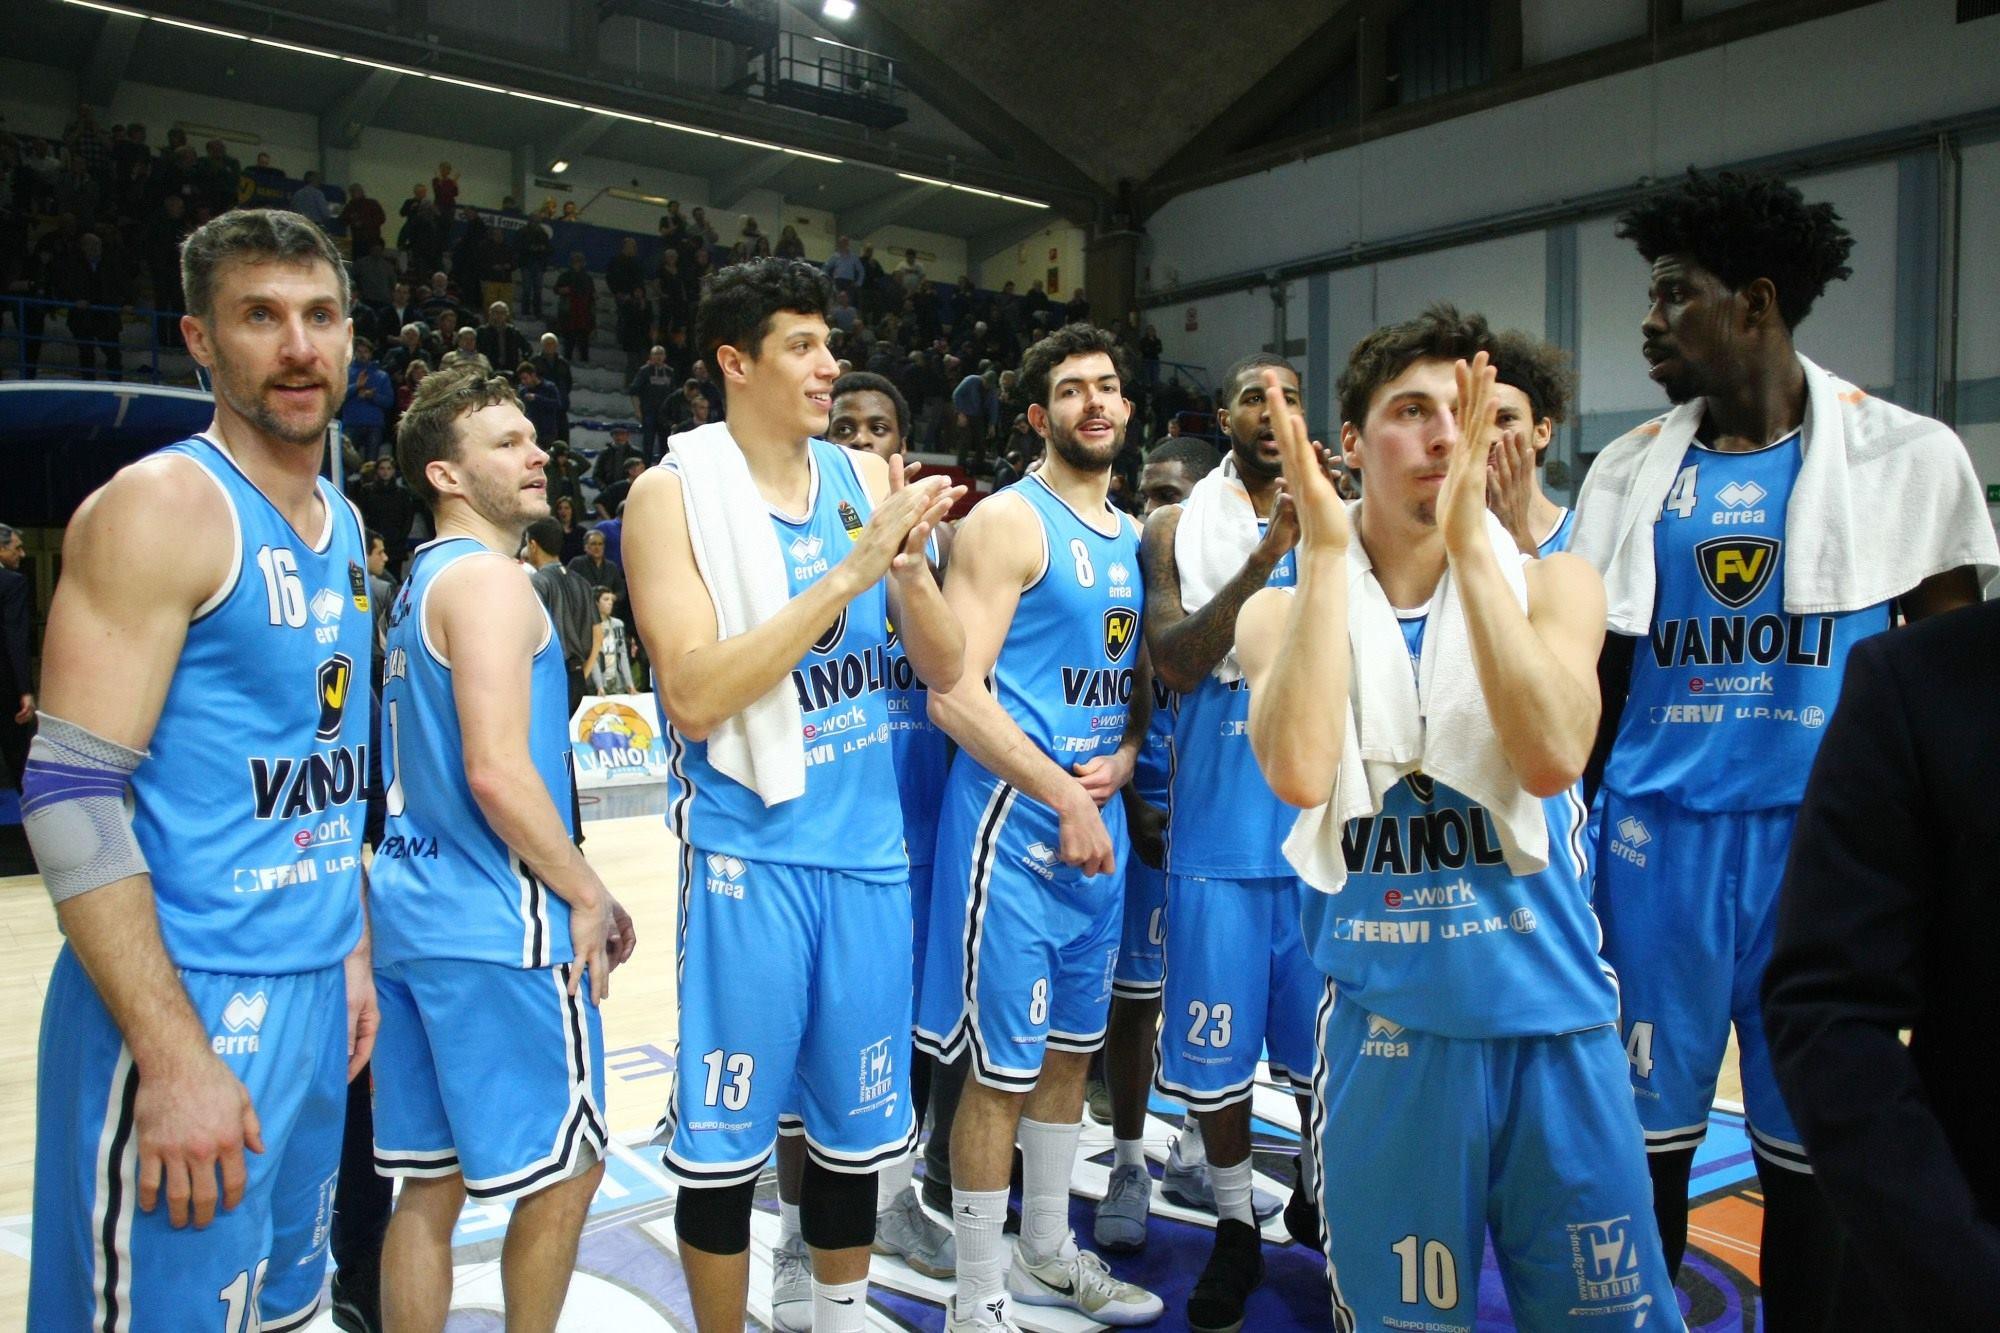 Lega A PosteMobile 2017-18: la Vanoli Cremona gioca bene e supera la Victoria Libertas Pesaro 92-79